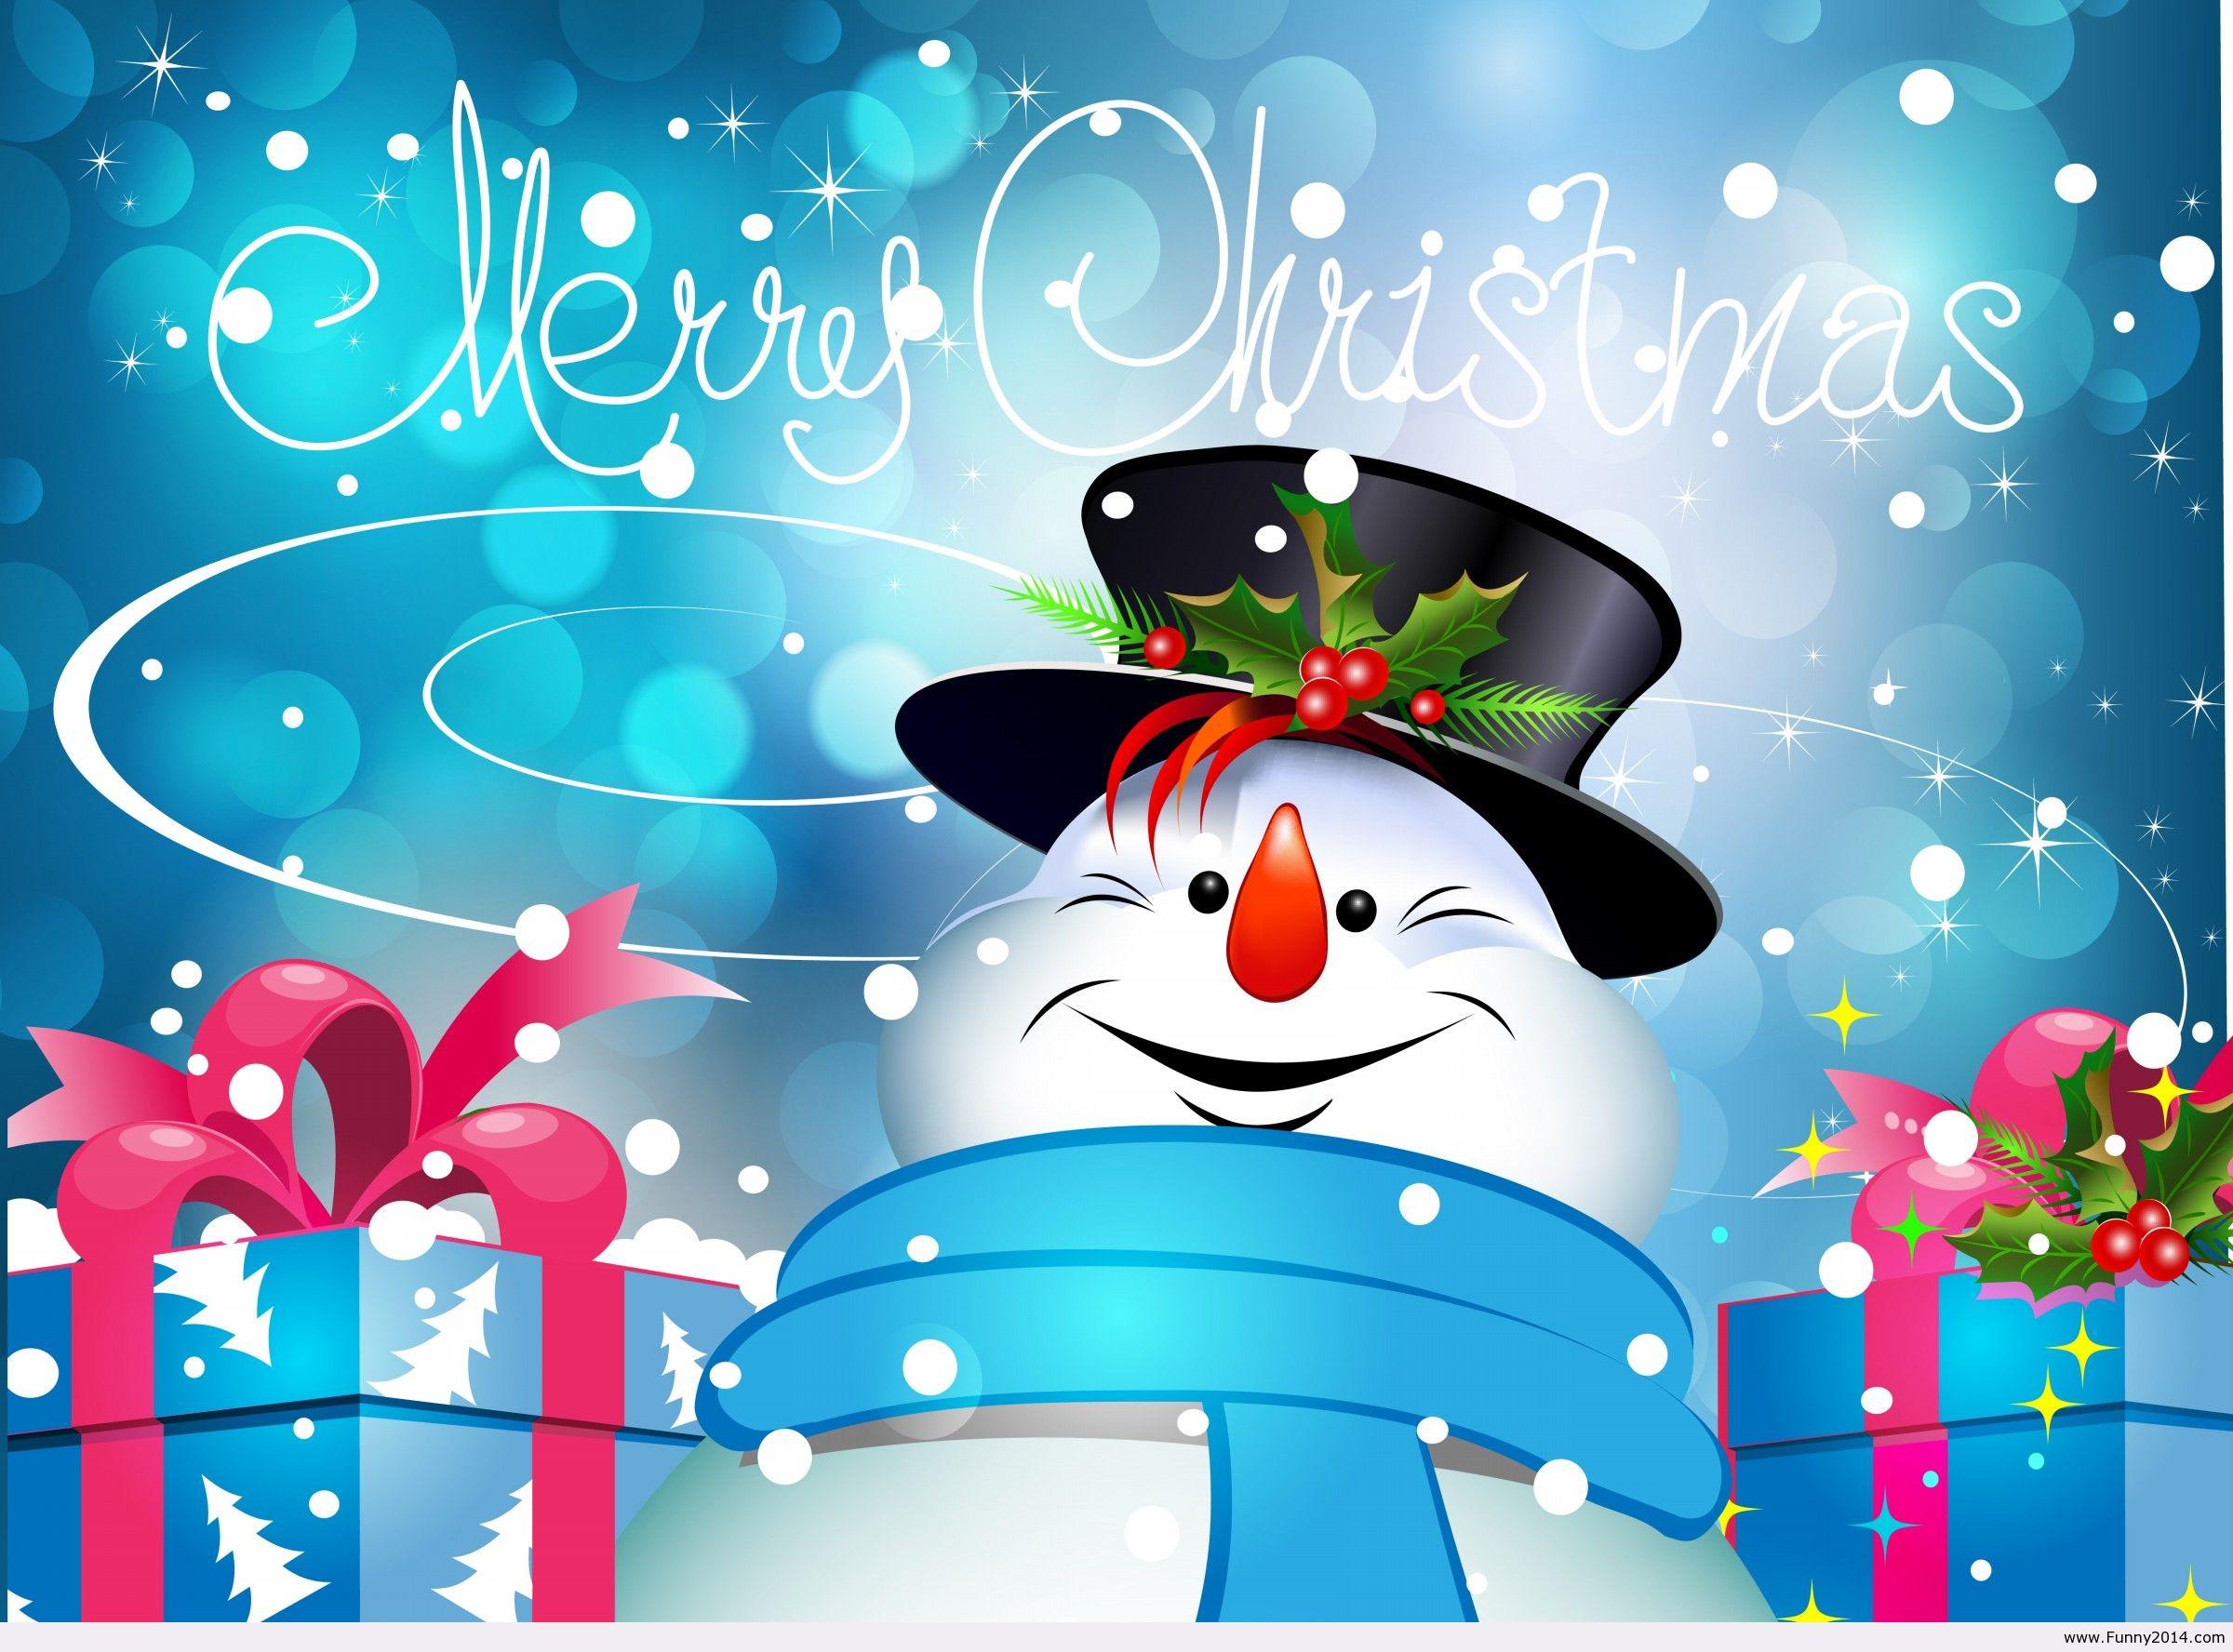 merry christmas wallpapers funny - hd desktop wallpapers | 4k hd